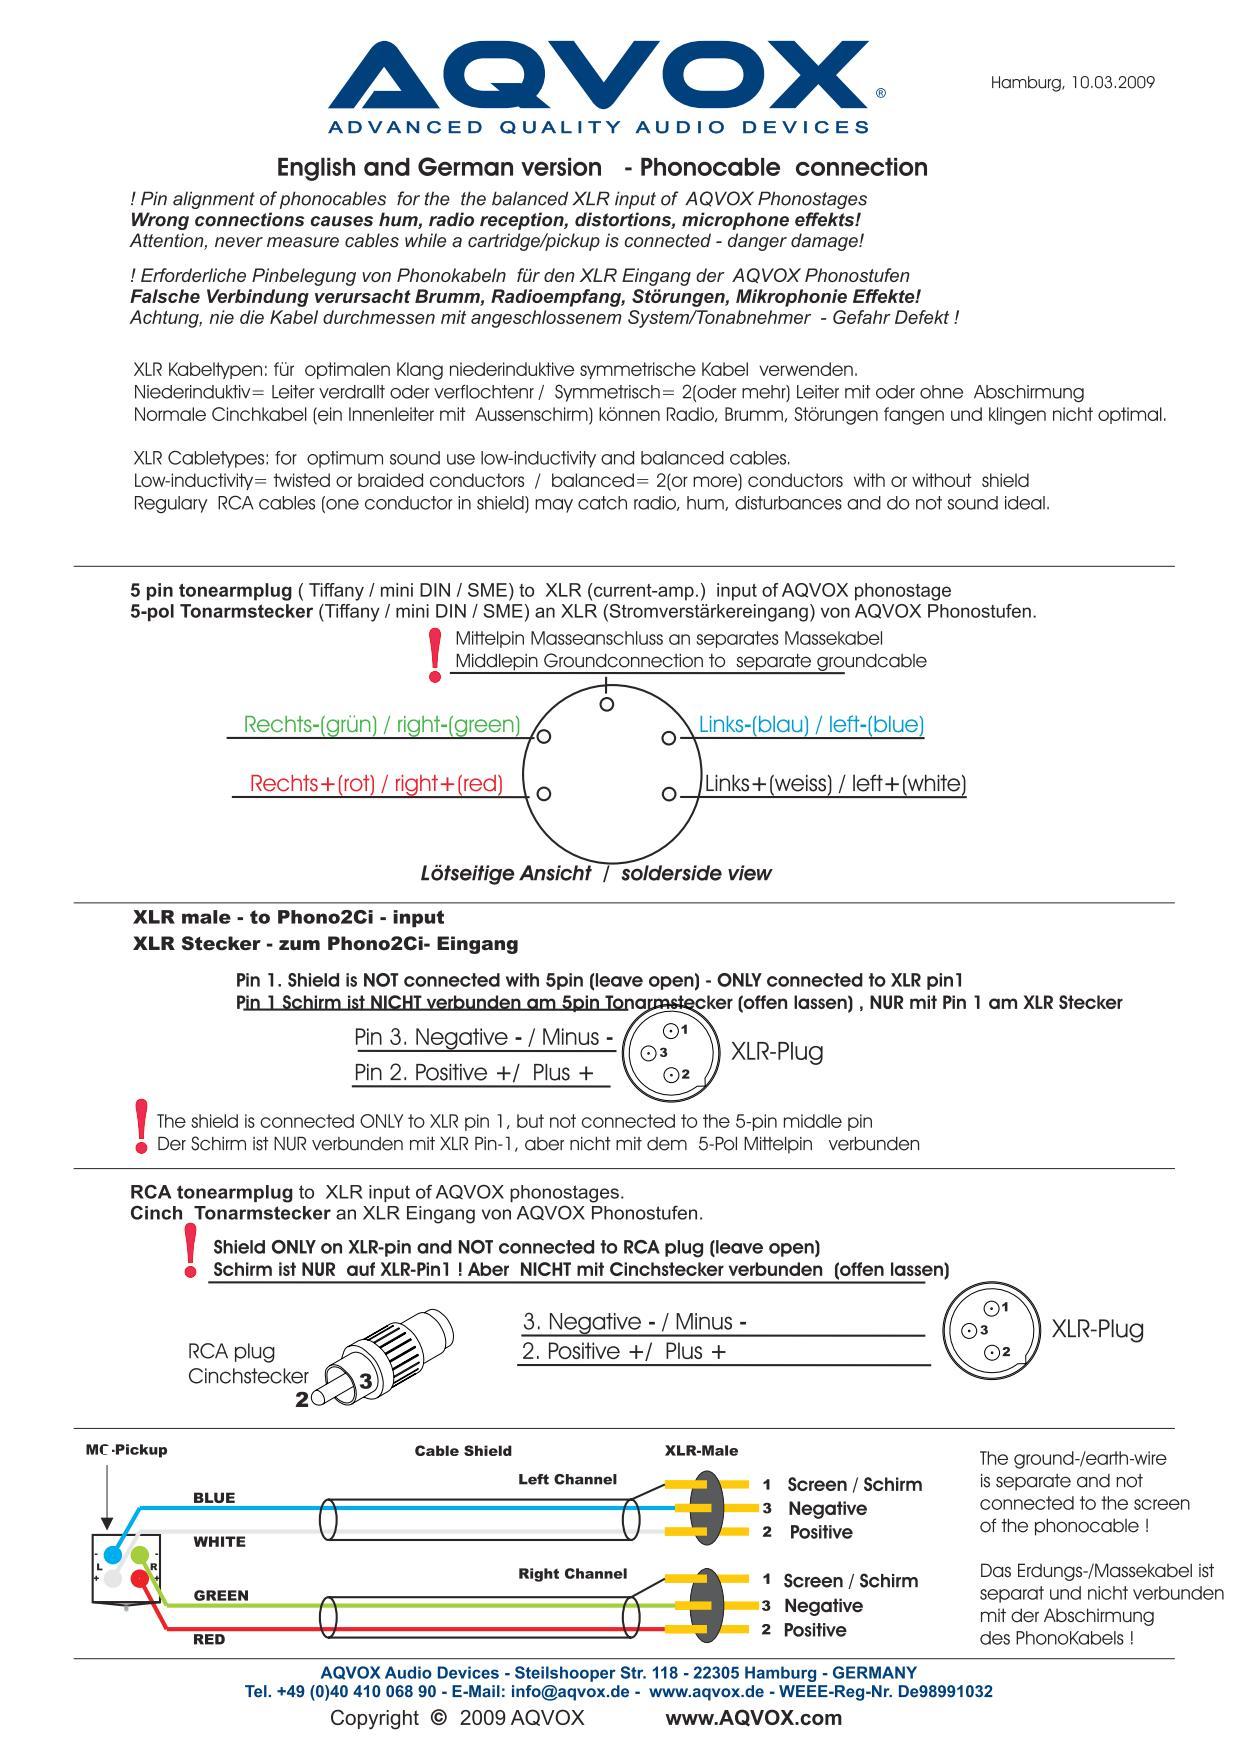 Recablear SME 3009 SERIES II IMPROVED, help! Aqvox-10